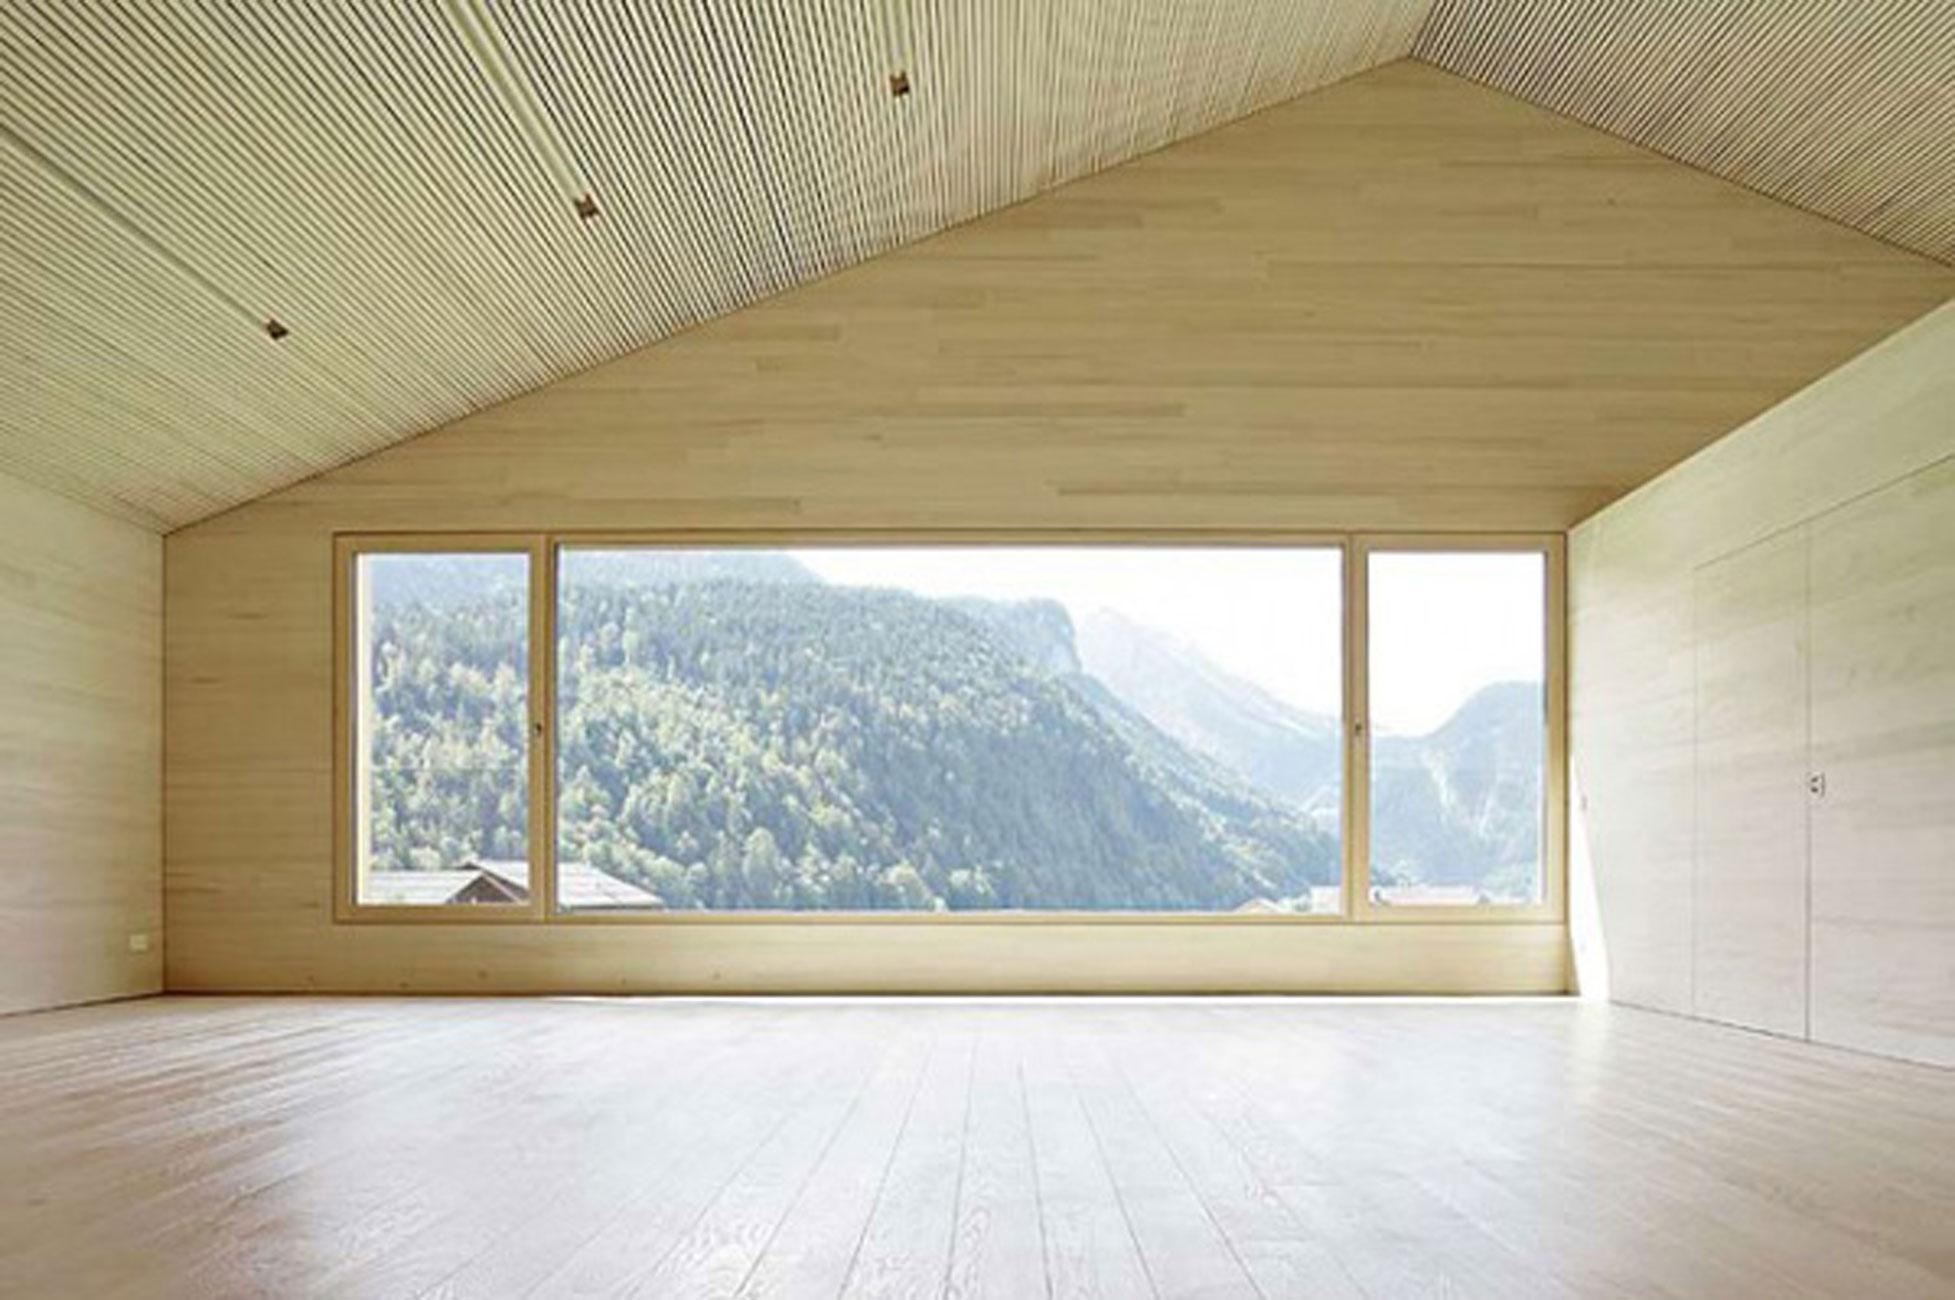 Minimalist Wooden House Ideas By Bernardo Bader Top Room